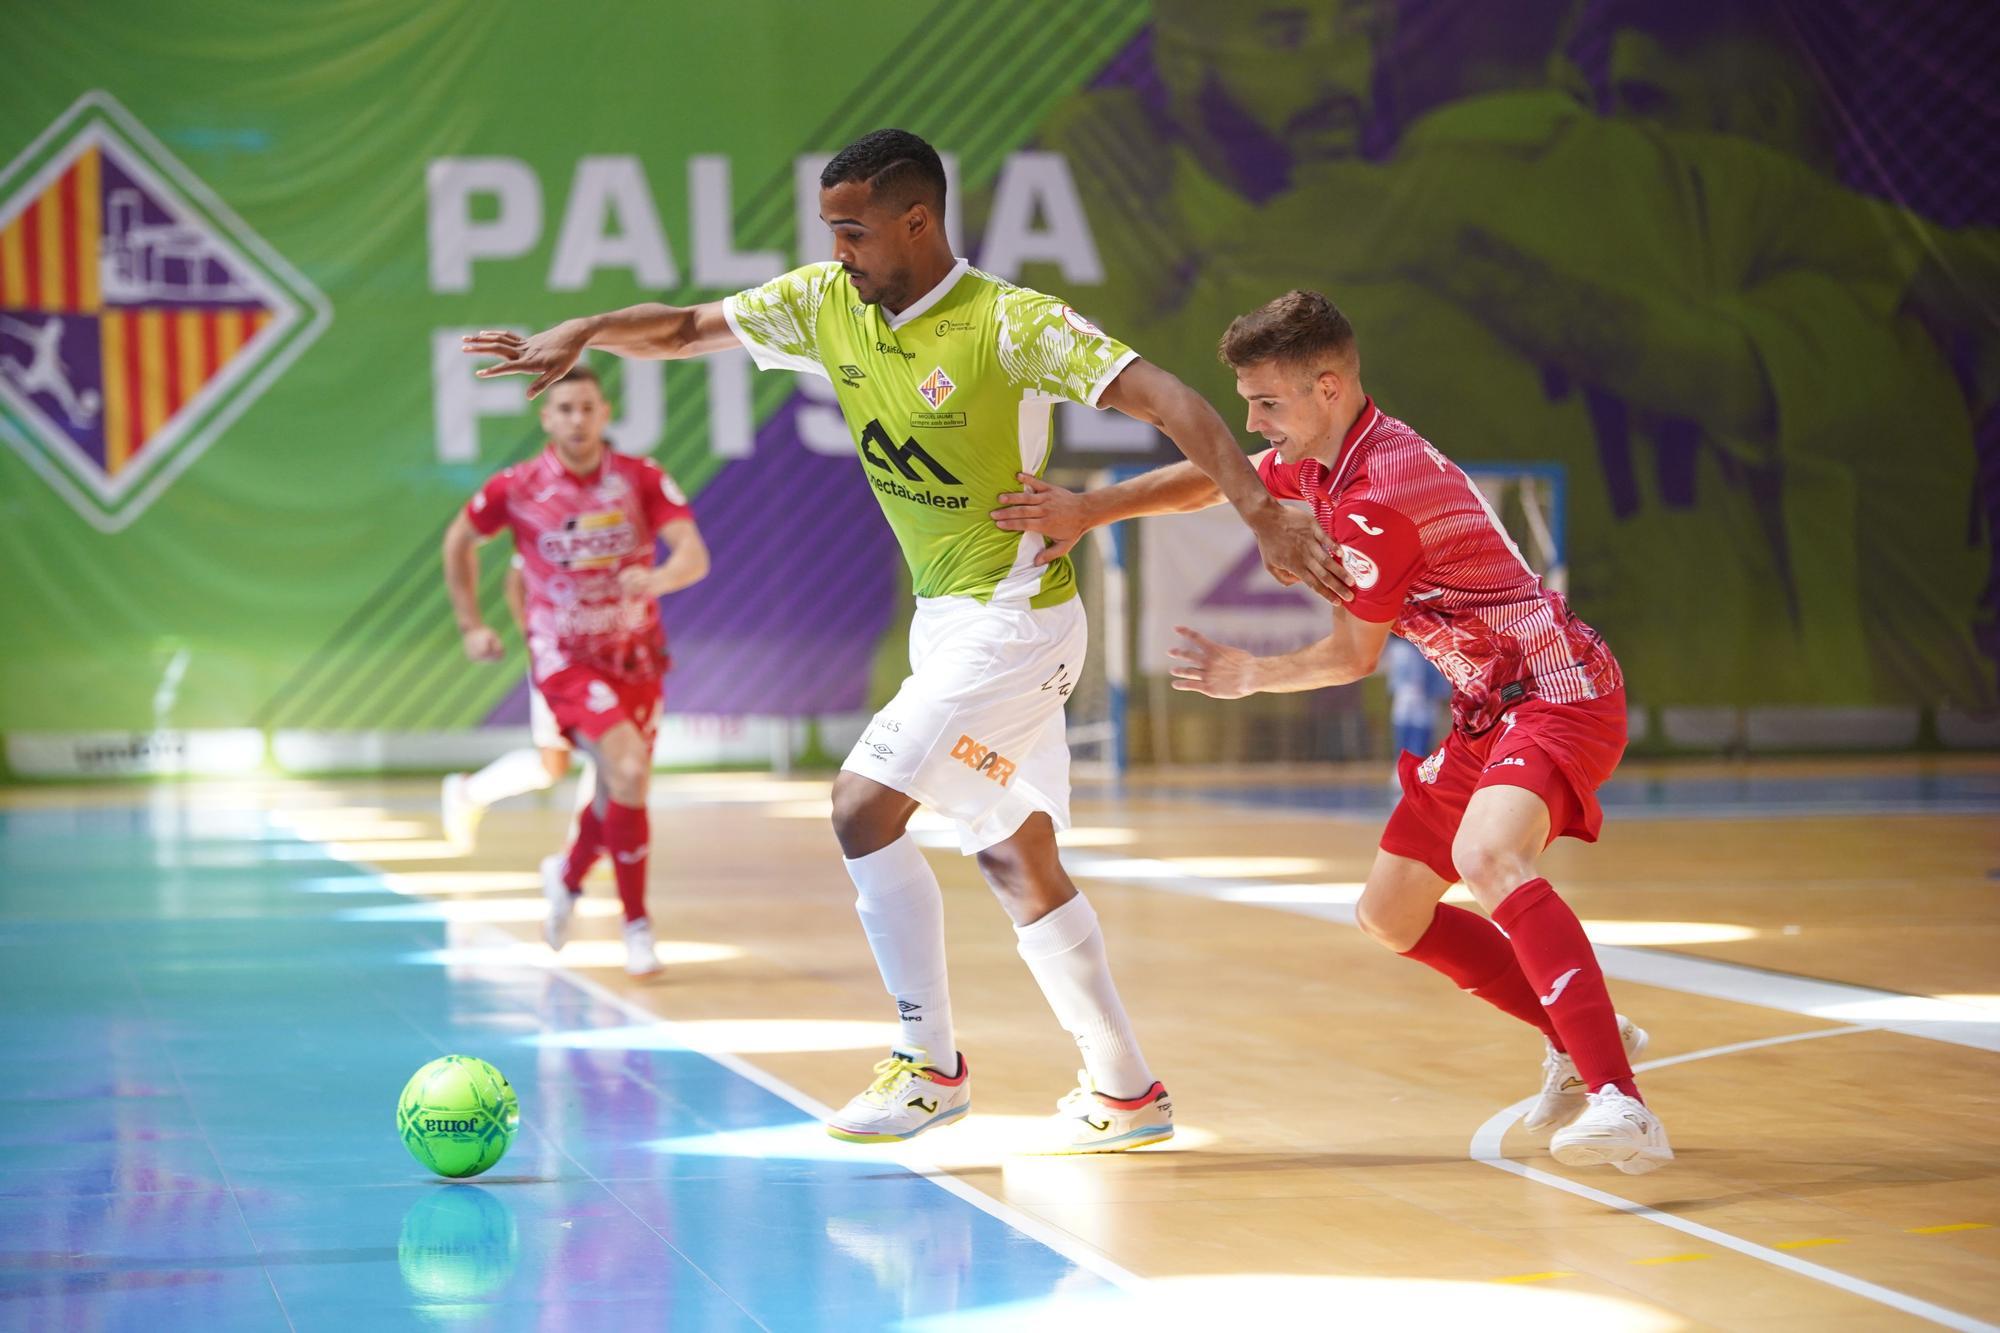 El Palma Futsal cede ante ElPozo Murcia en Son Moix